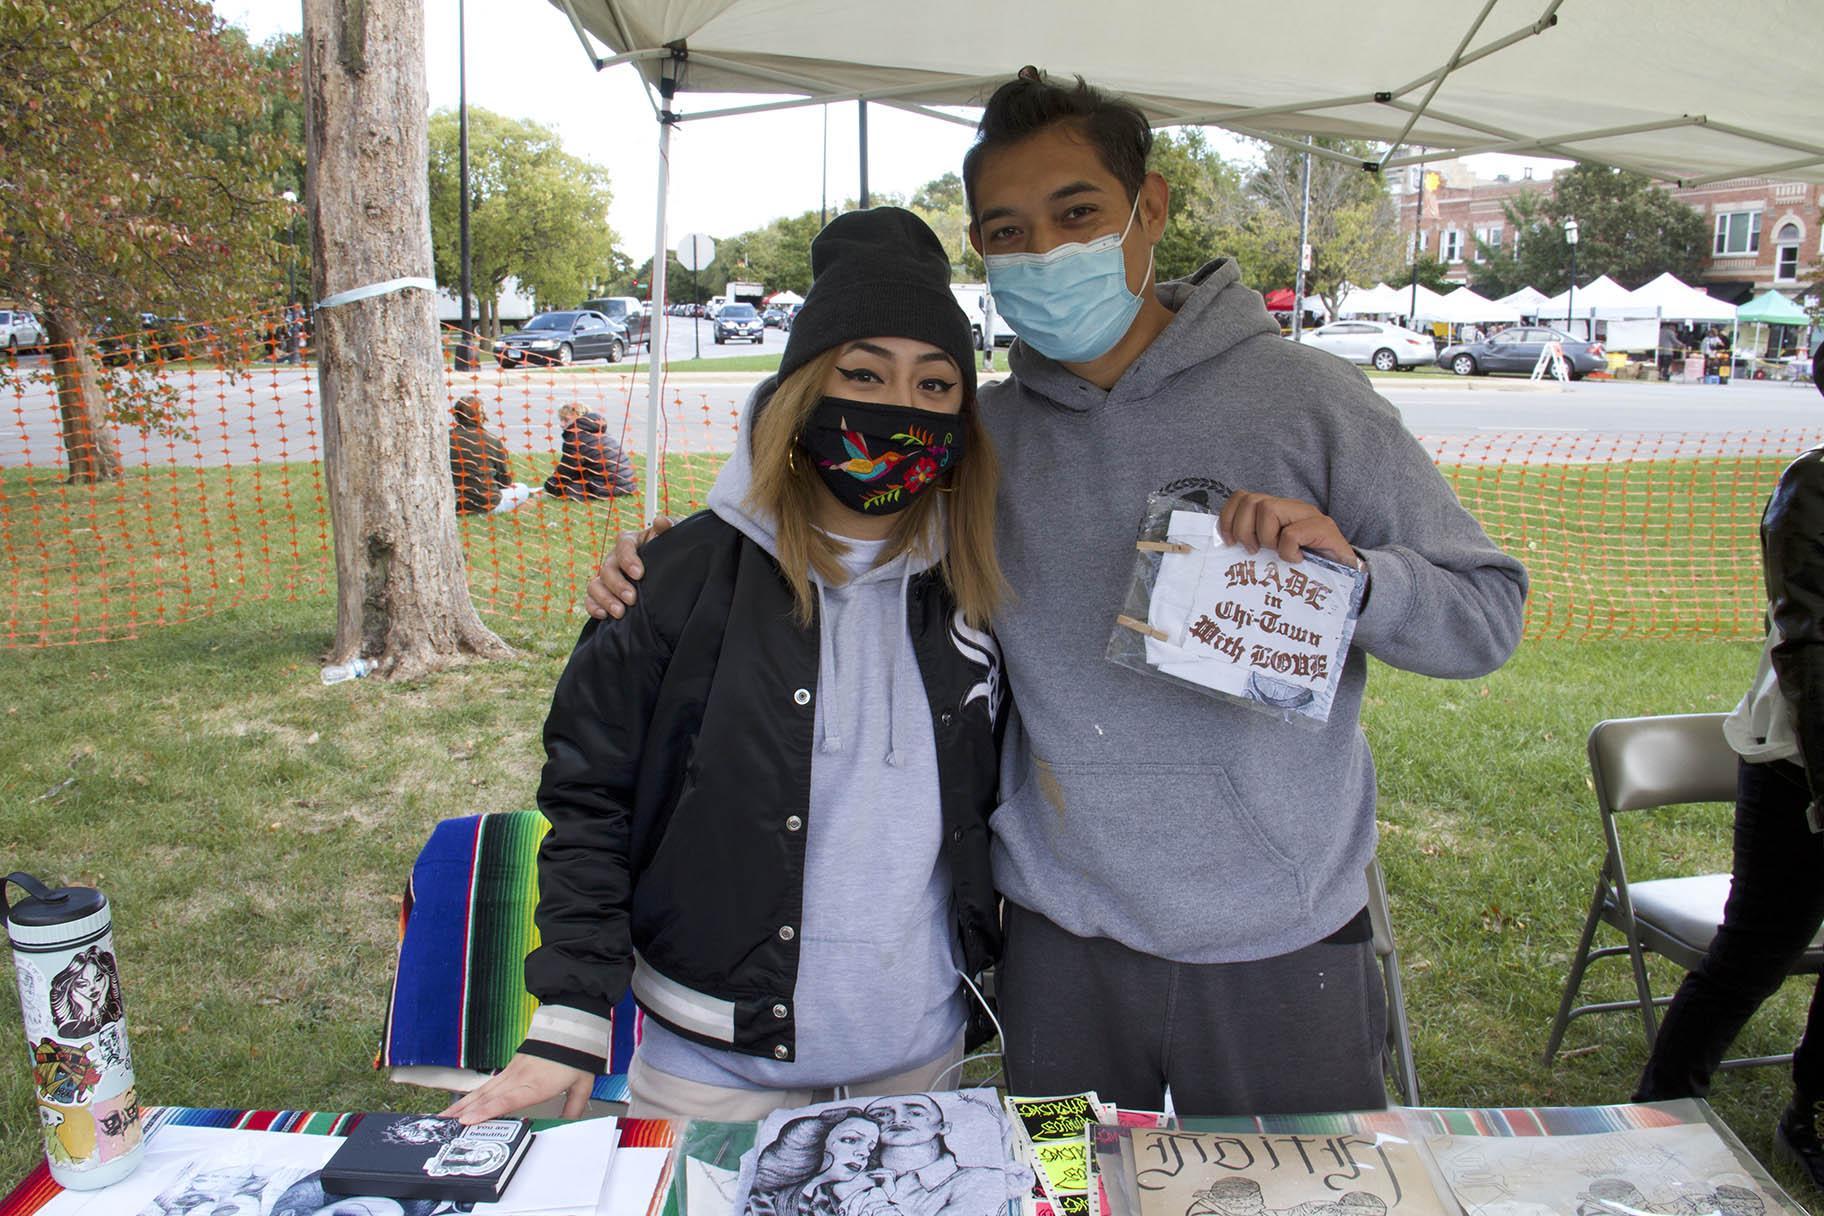 Artists Michelle Vega and Sir Charles at Zinemercado in Logan Square on Sunday, Oct. 4, 2020. (Ariel Parrella-Aureli / WTTW News)